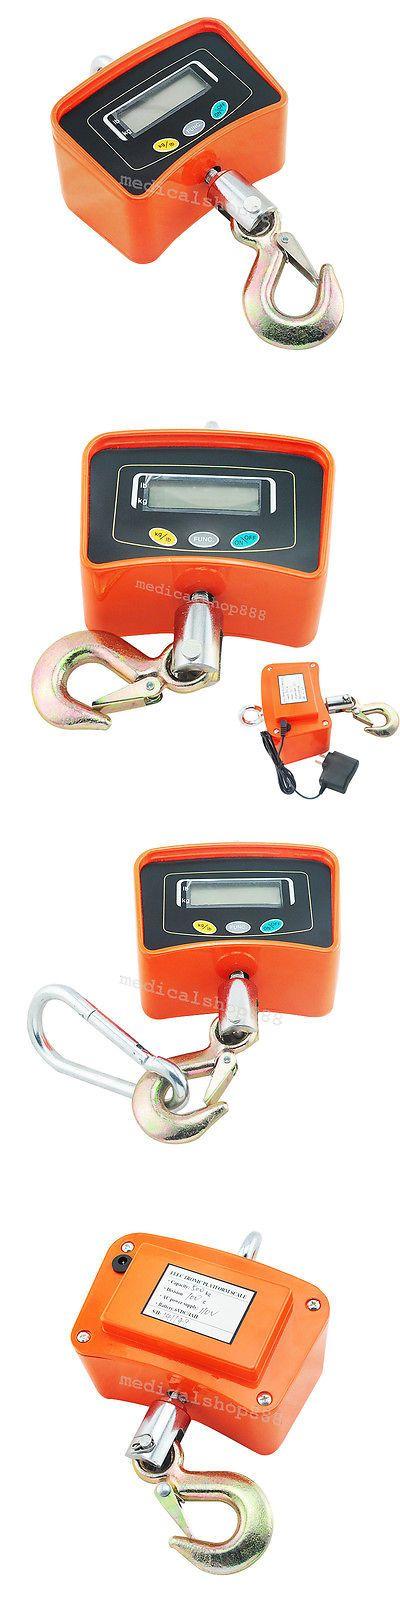 Pocket Digital Scales: 500Kg 1100Lbs Digital Electronic Hanging Crane Scale Heavy Duty Industrial Hot -> BUY IT NOW ONLY: $63.99 on eBay!